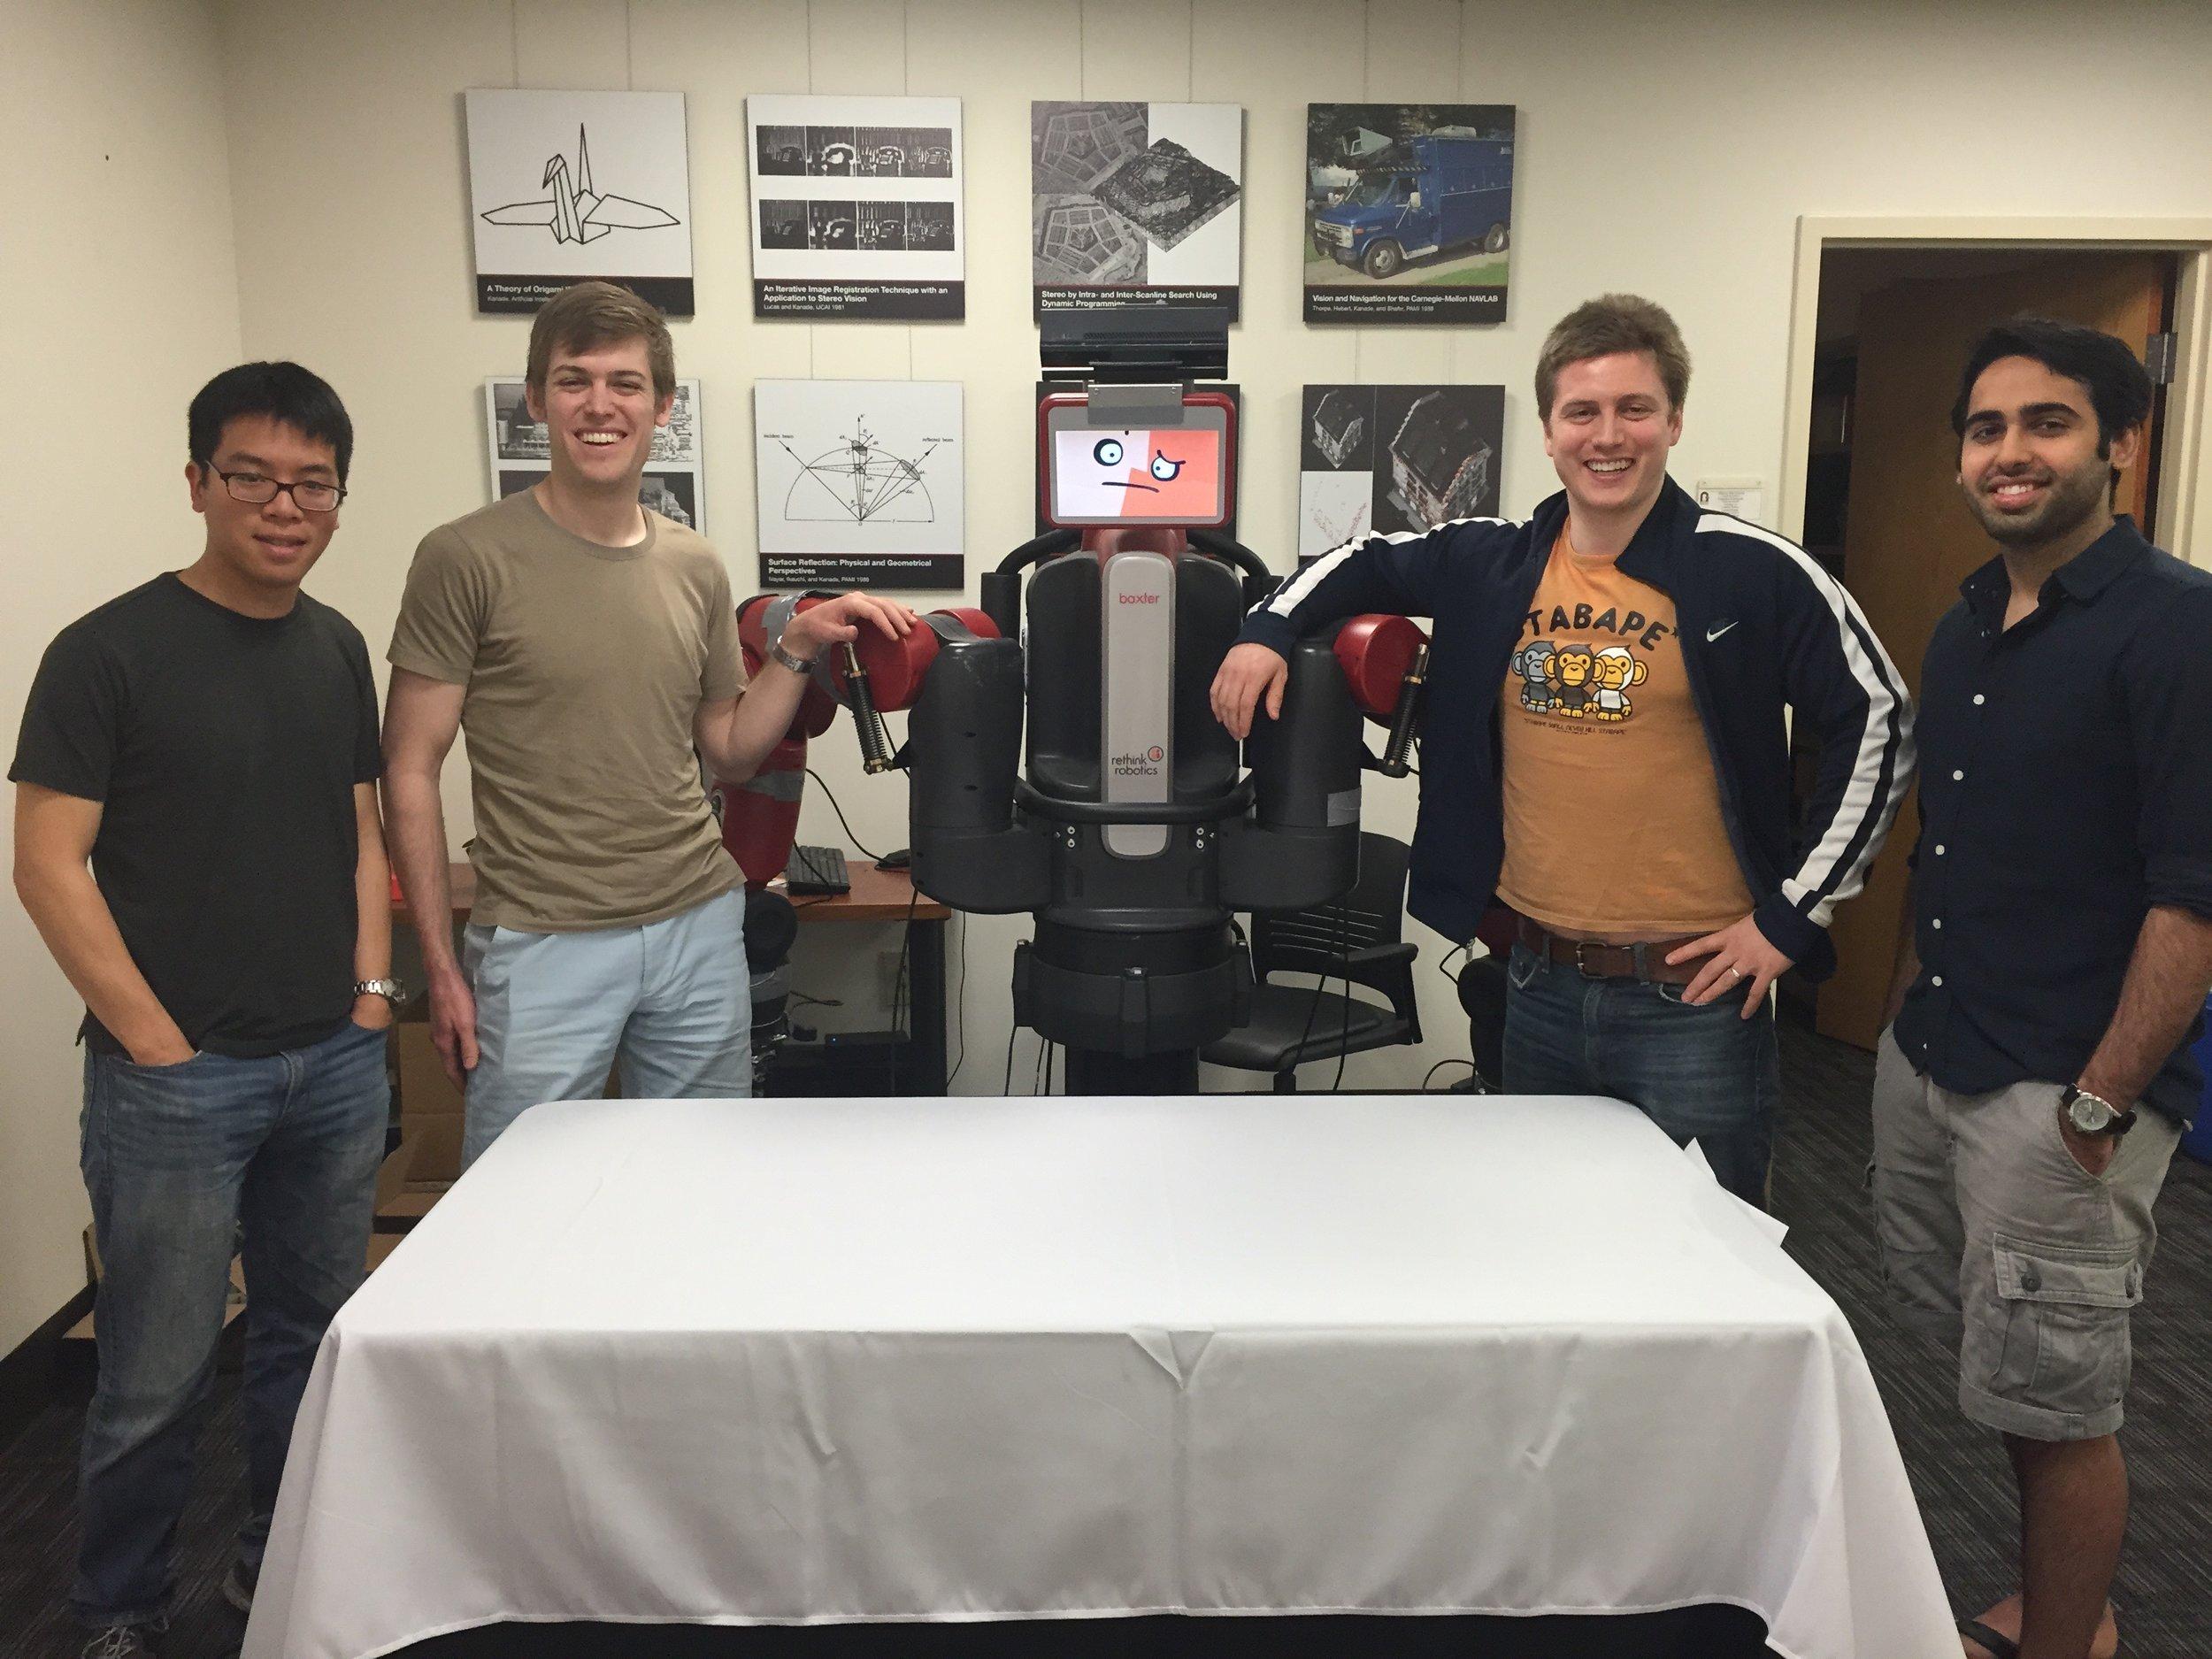 Alvin Chou, Gene Merewether, Mitch Kosowski, Gautam Narang - Robotics Engineers